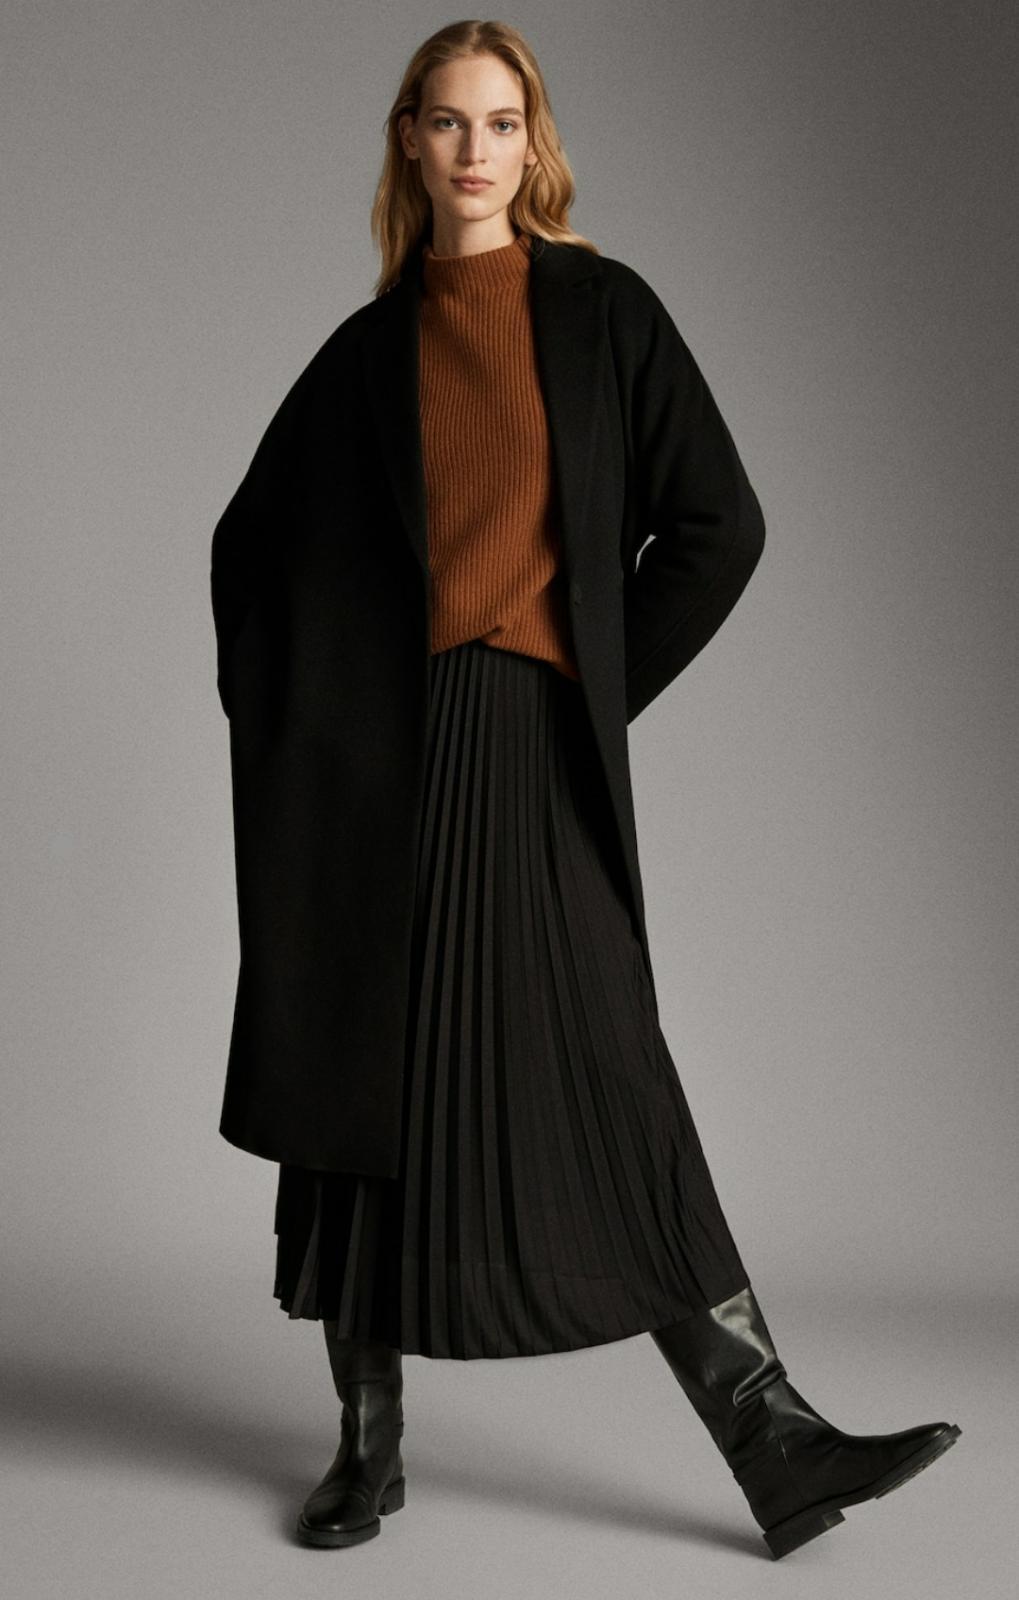 Falda plisada color negro de Massimo Dutti 19'95€